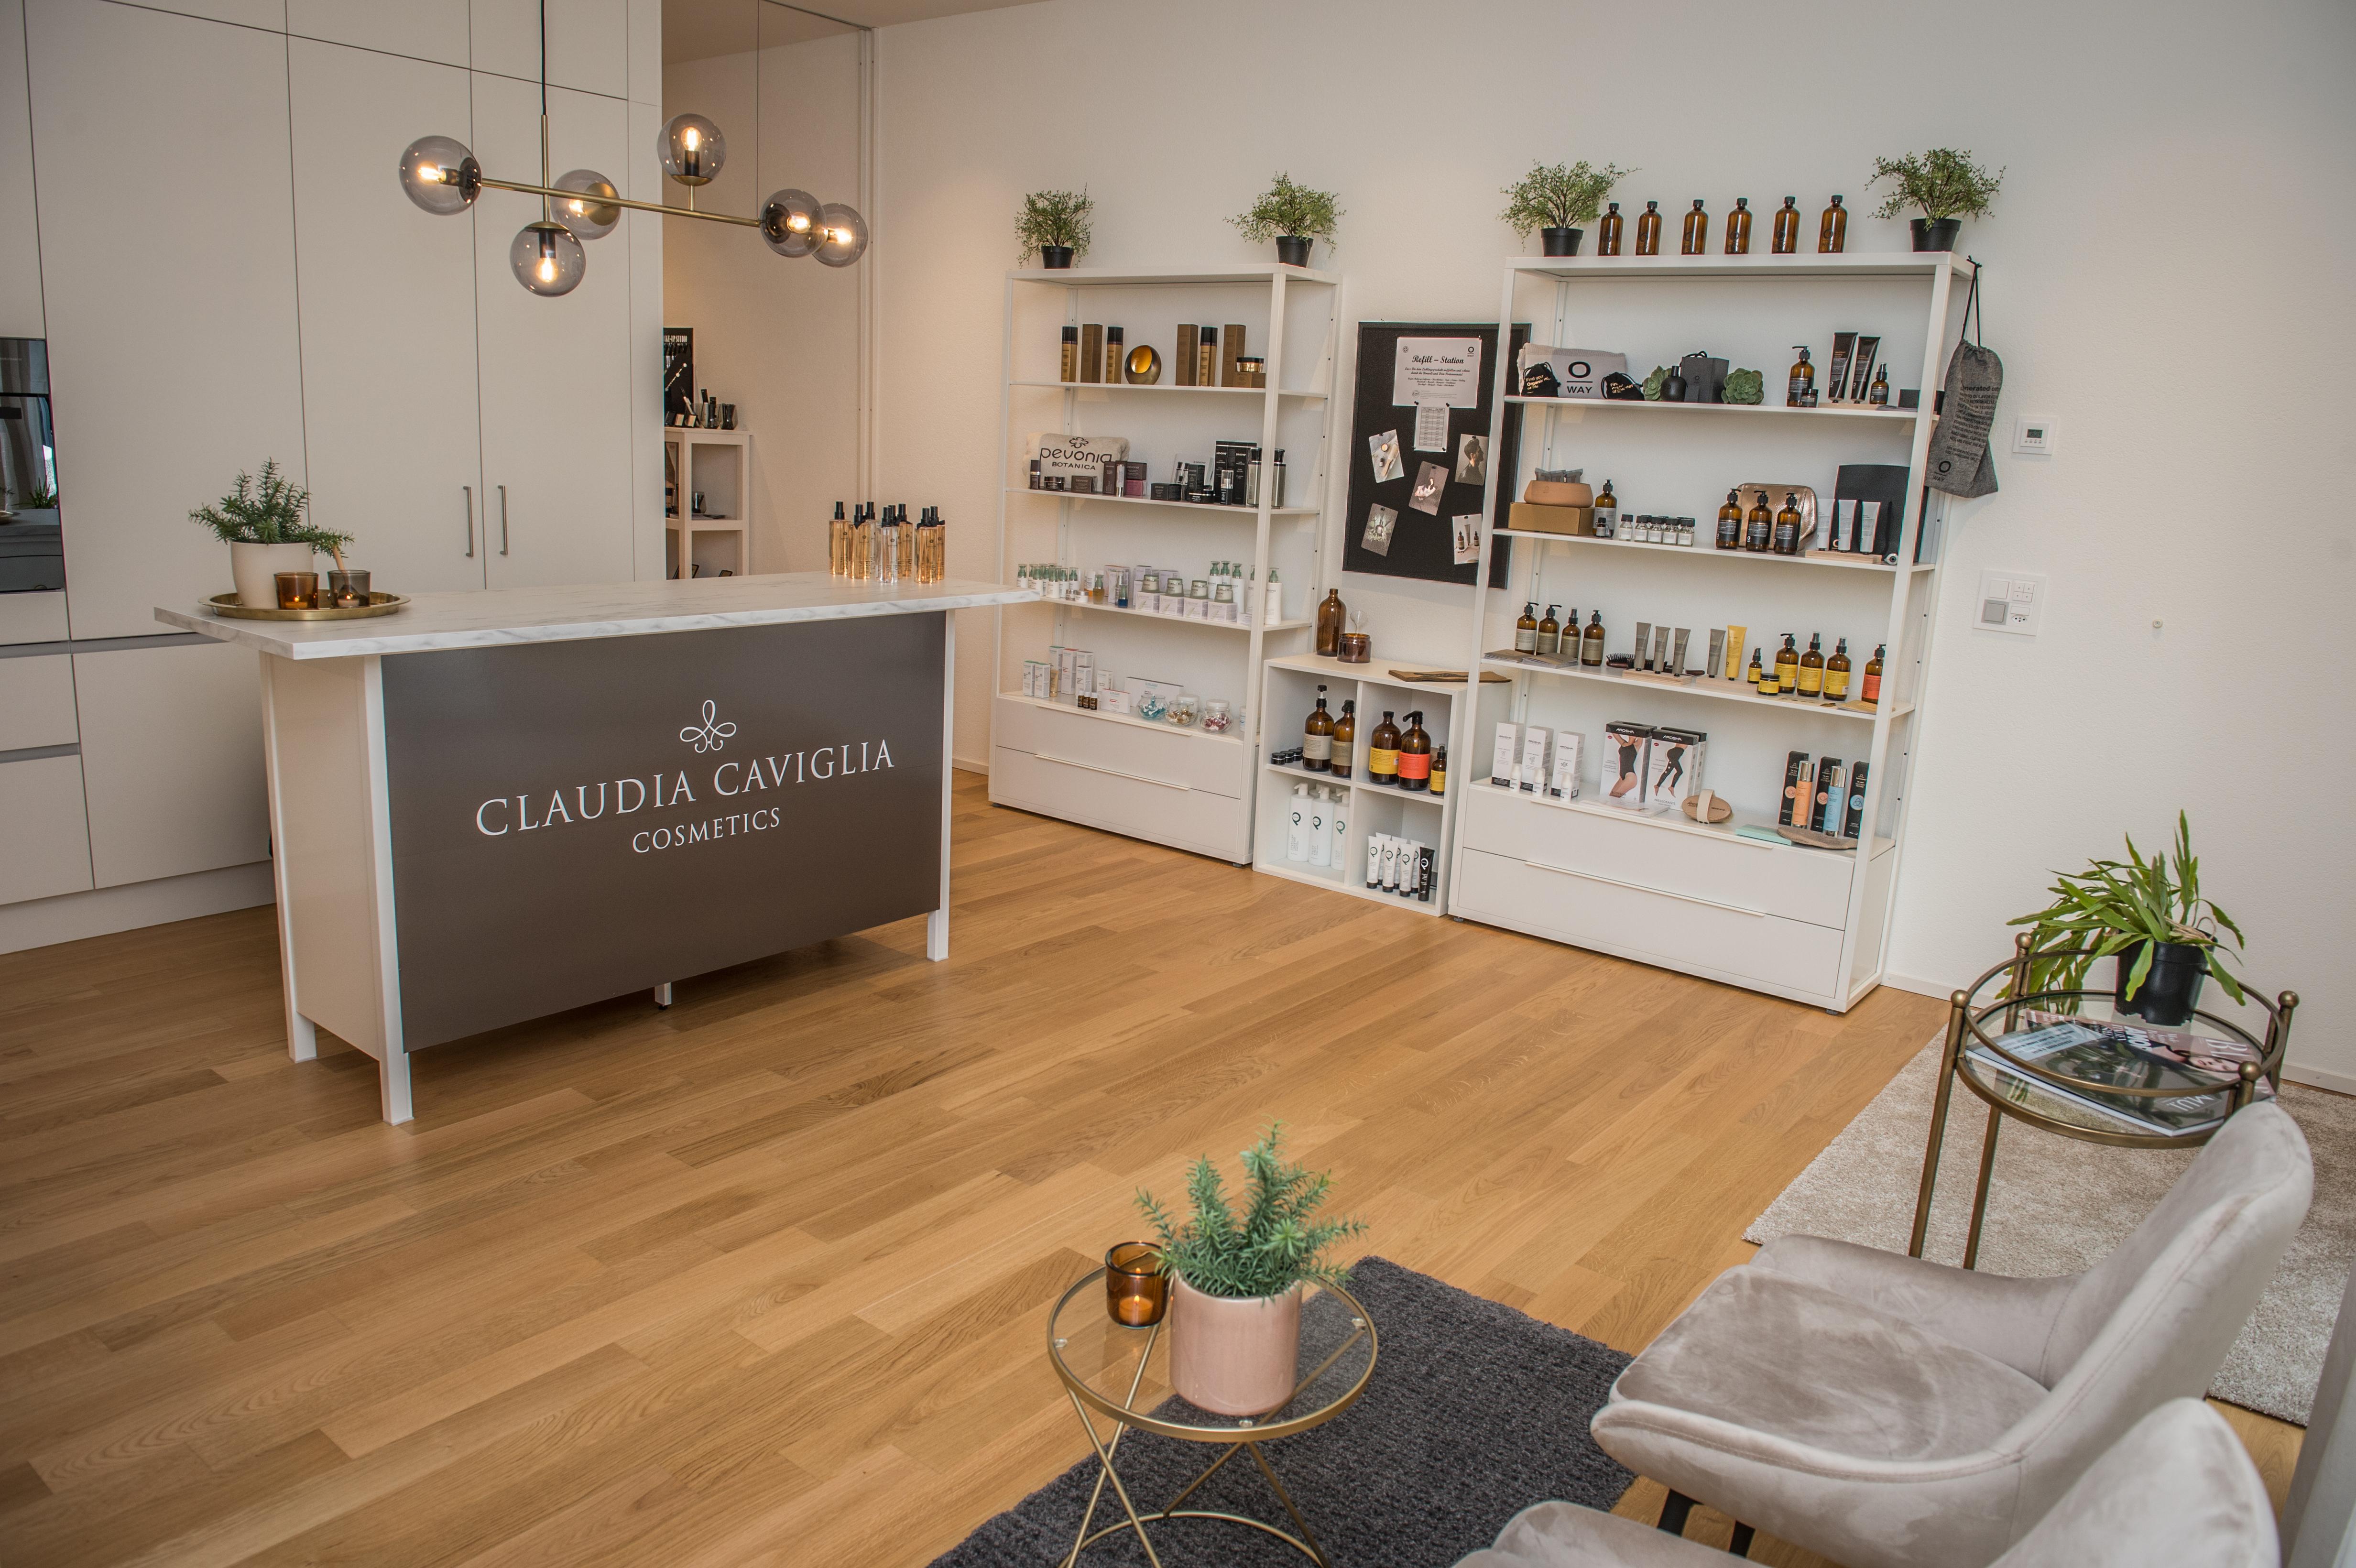 Beauty-Shop und Empfang